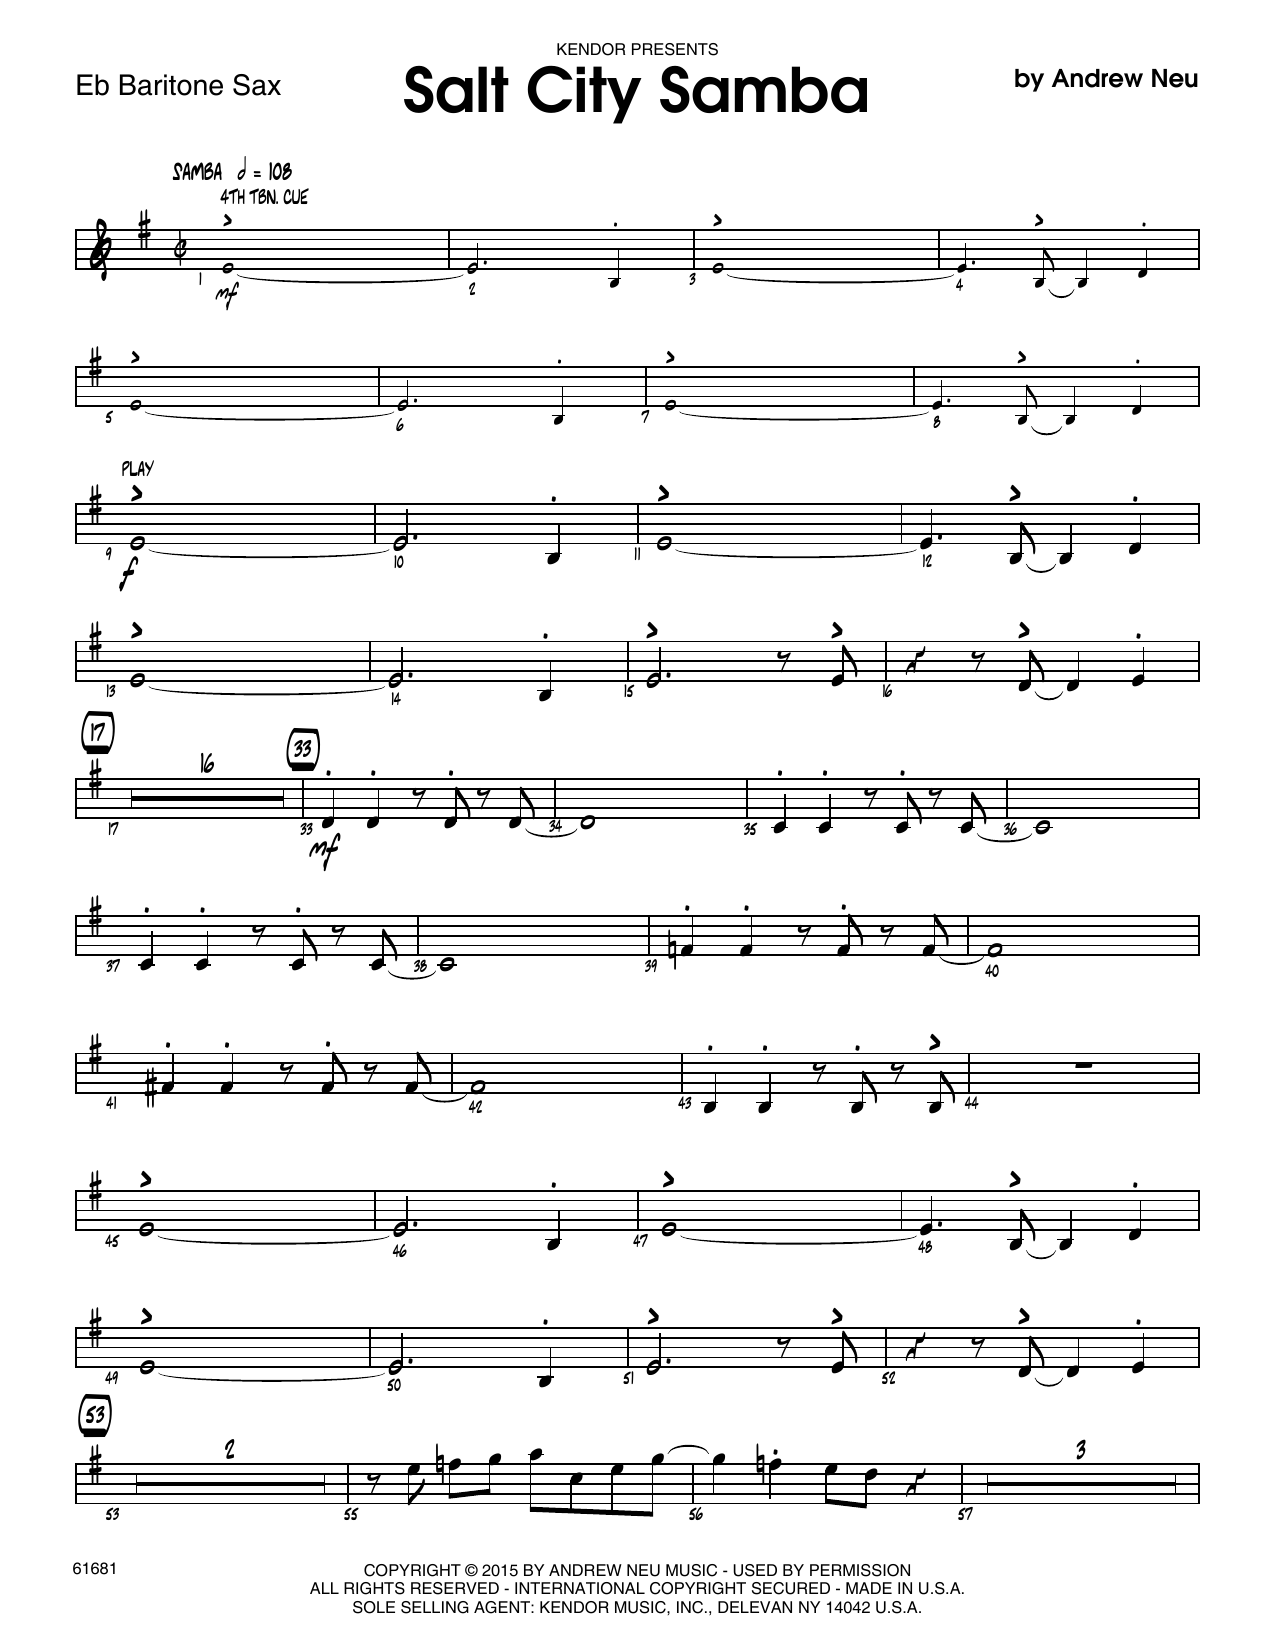 Salt City Samba - Eb Baritone Saxophone